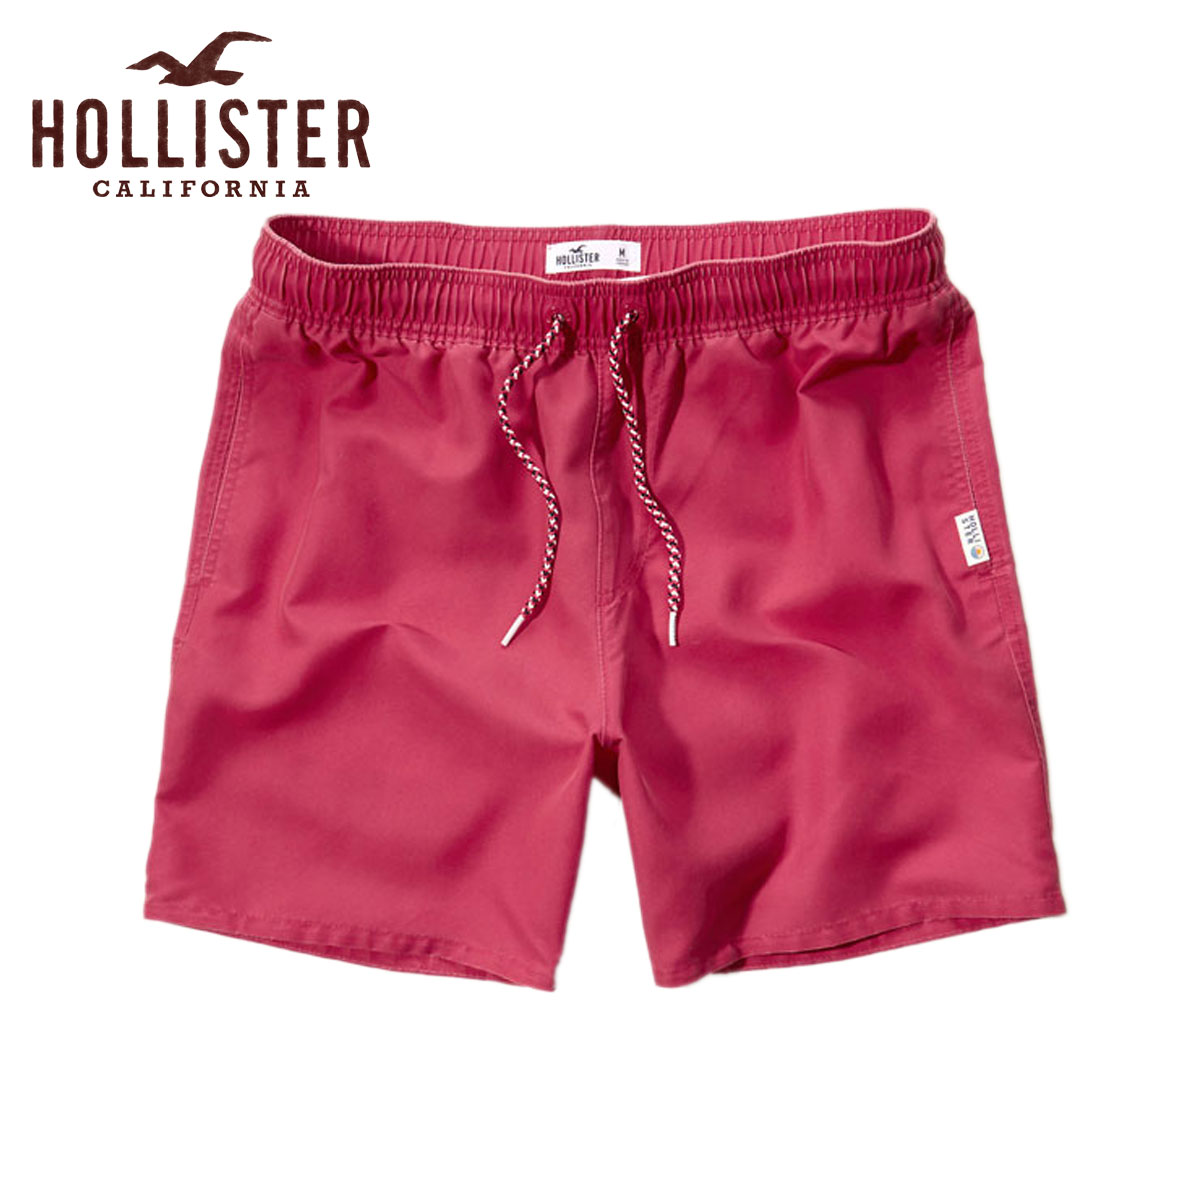 90f3552790c7d Hori star HOLLISTER regular article men swimming underwear swimsuit Beach  To Street Swim Shorts 333- ...